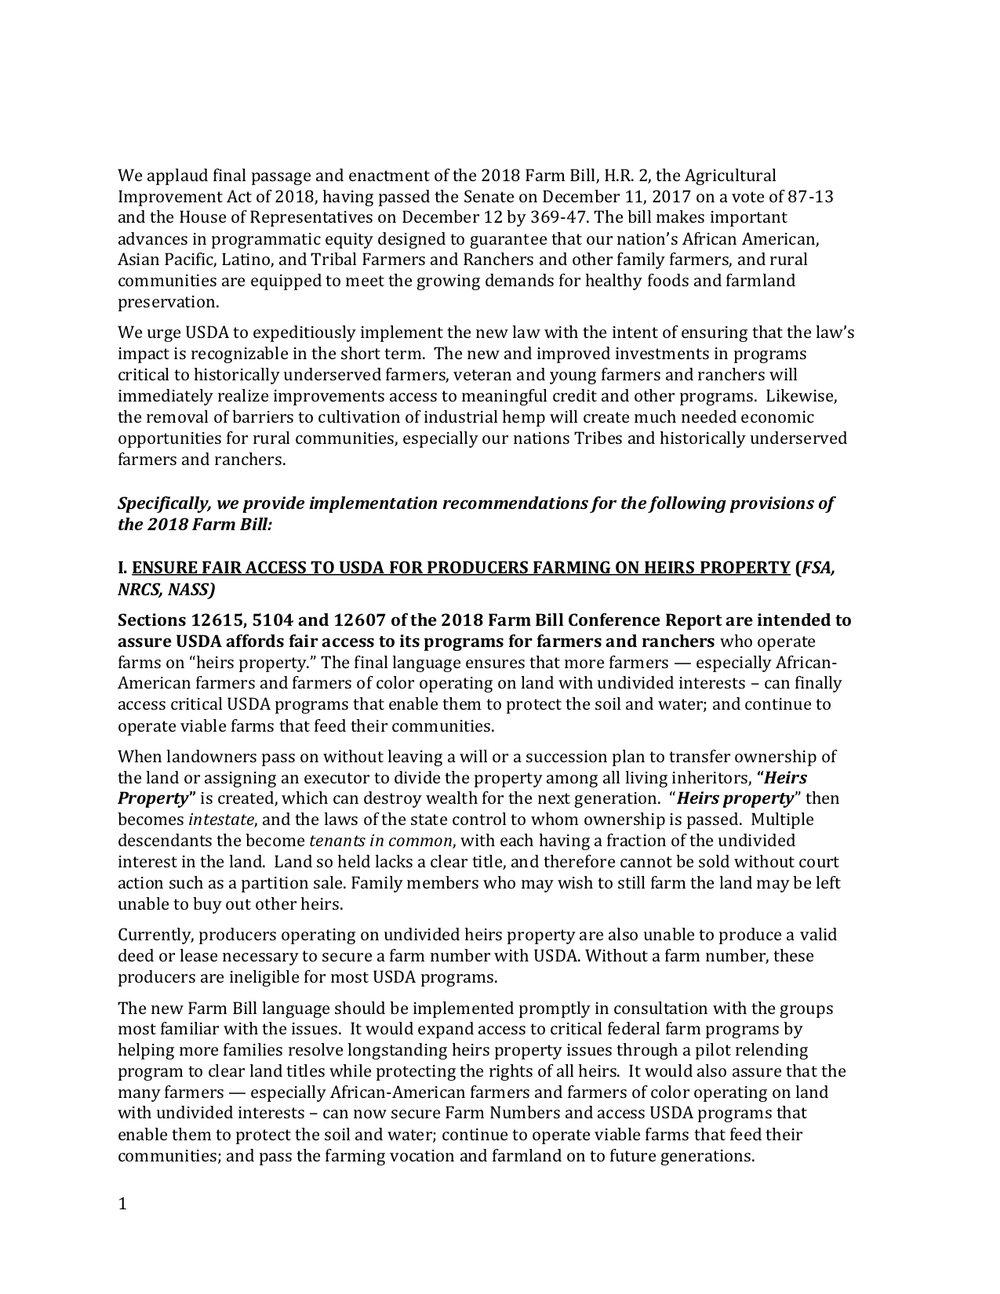 2018 Farm Bill Implementation Recommendations - Rural Co etal final March 1 page 2.jpg